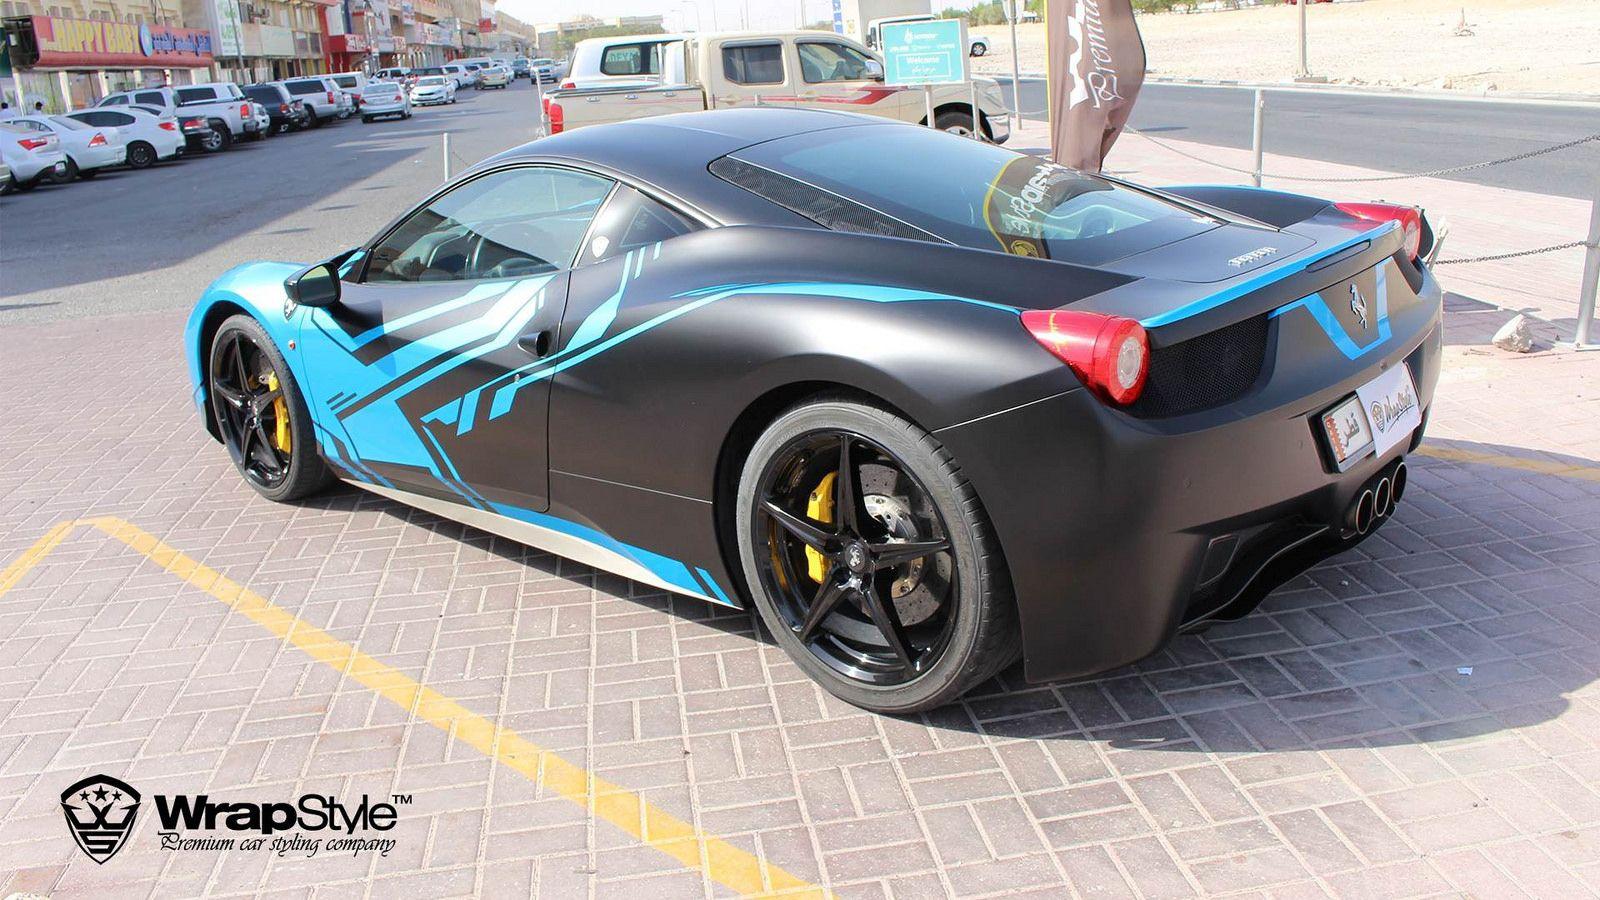 Superieur Ferrari 458 Italia Design 04 Wrapstyle Car Wrap Foil | By WrapStyle